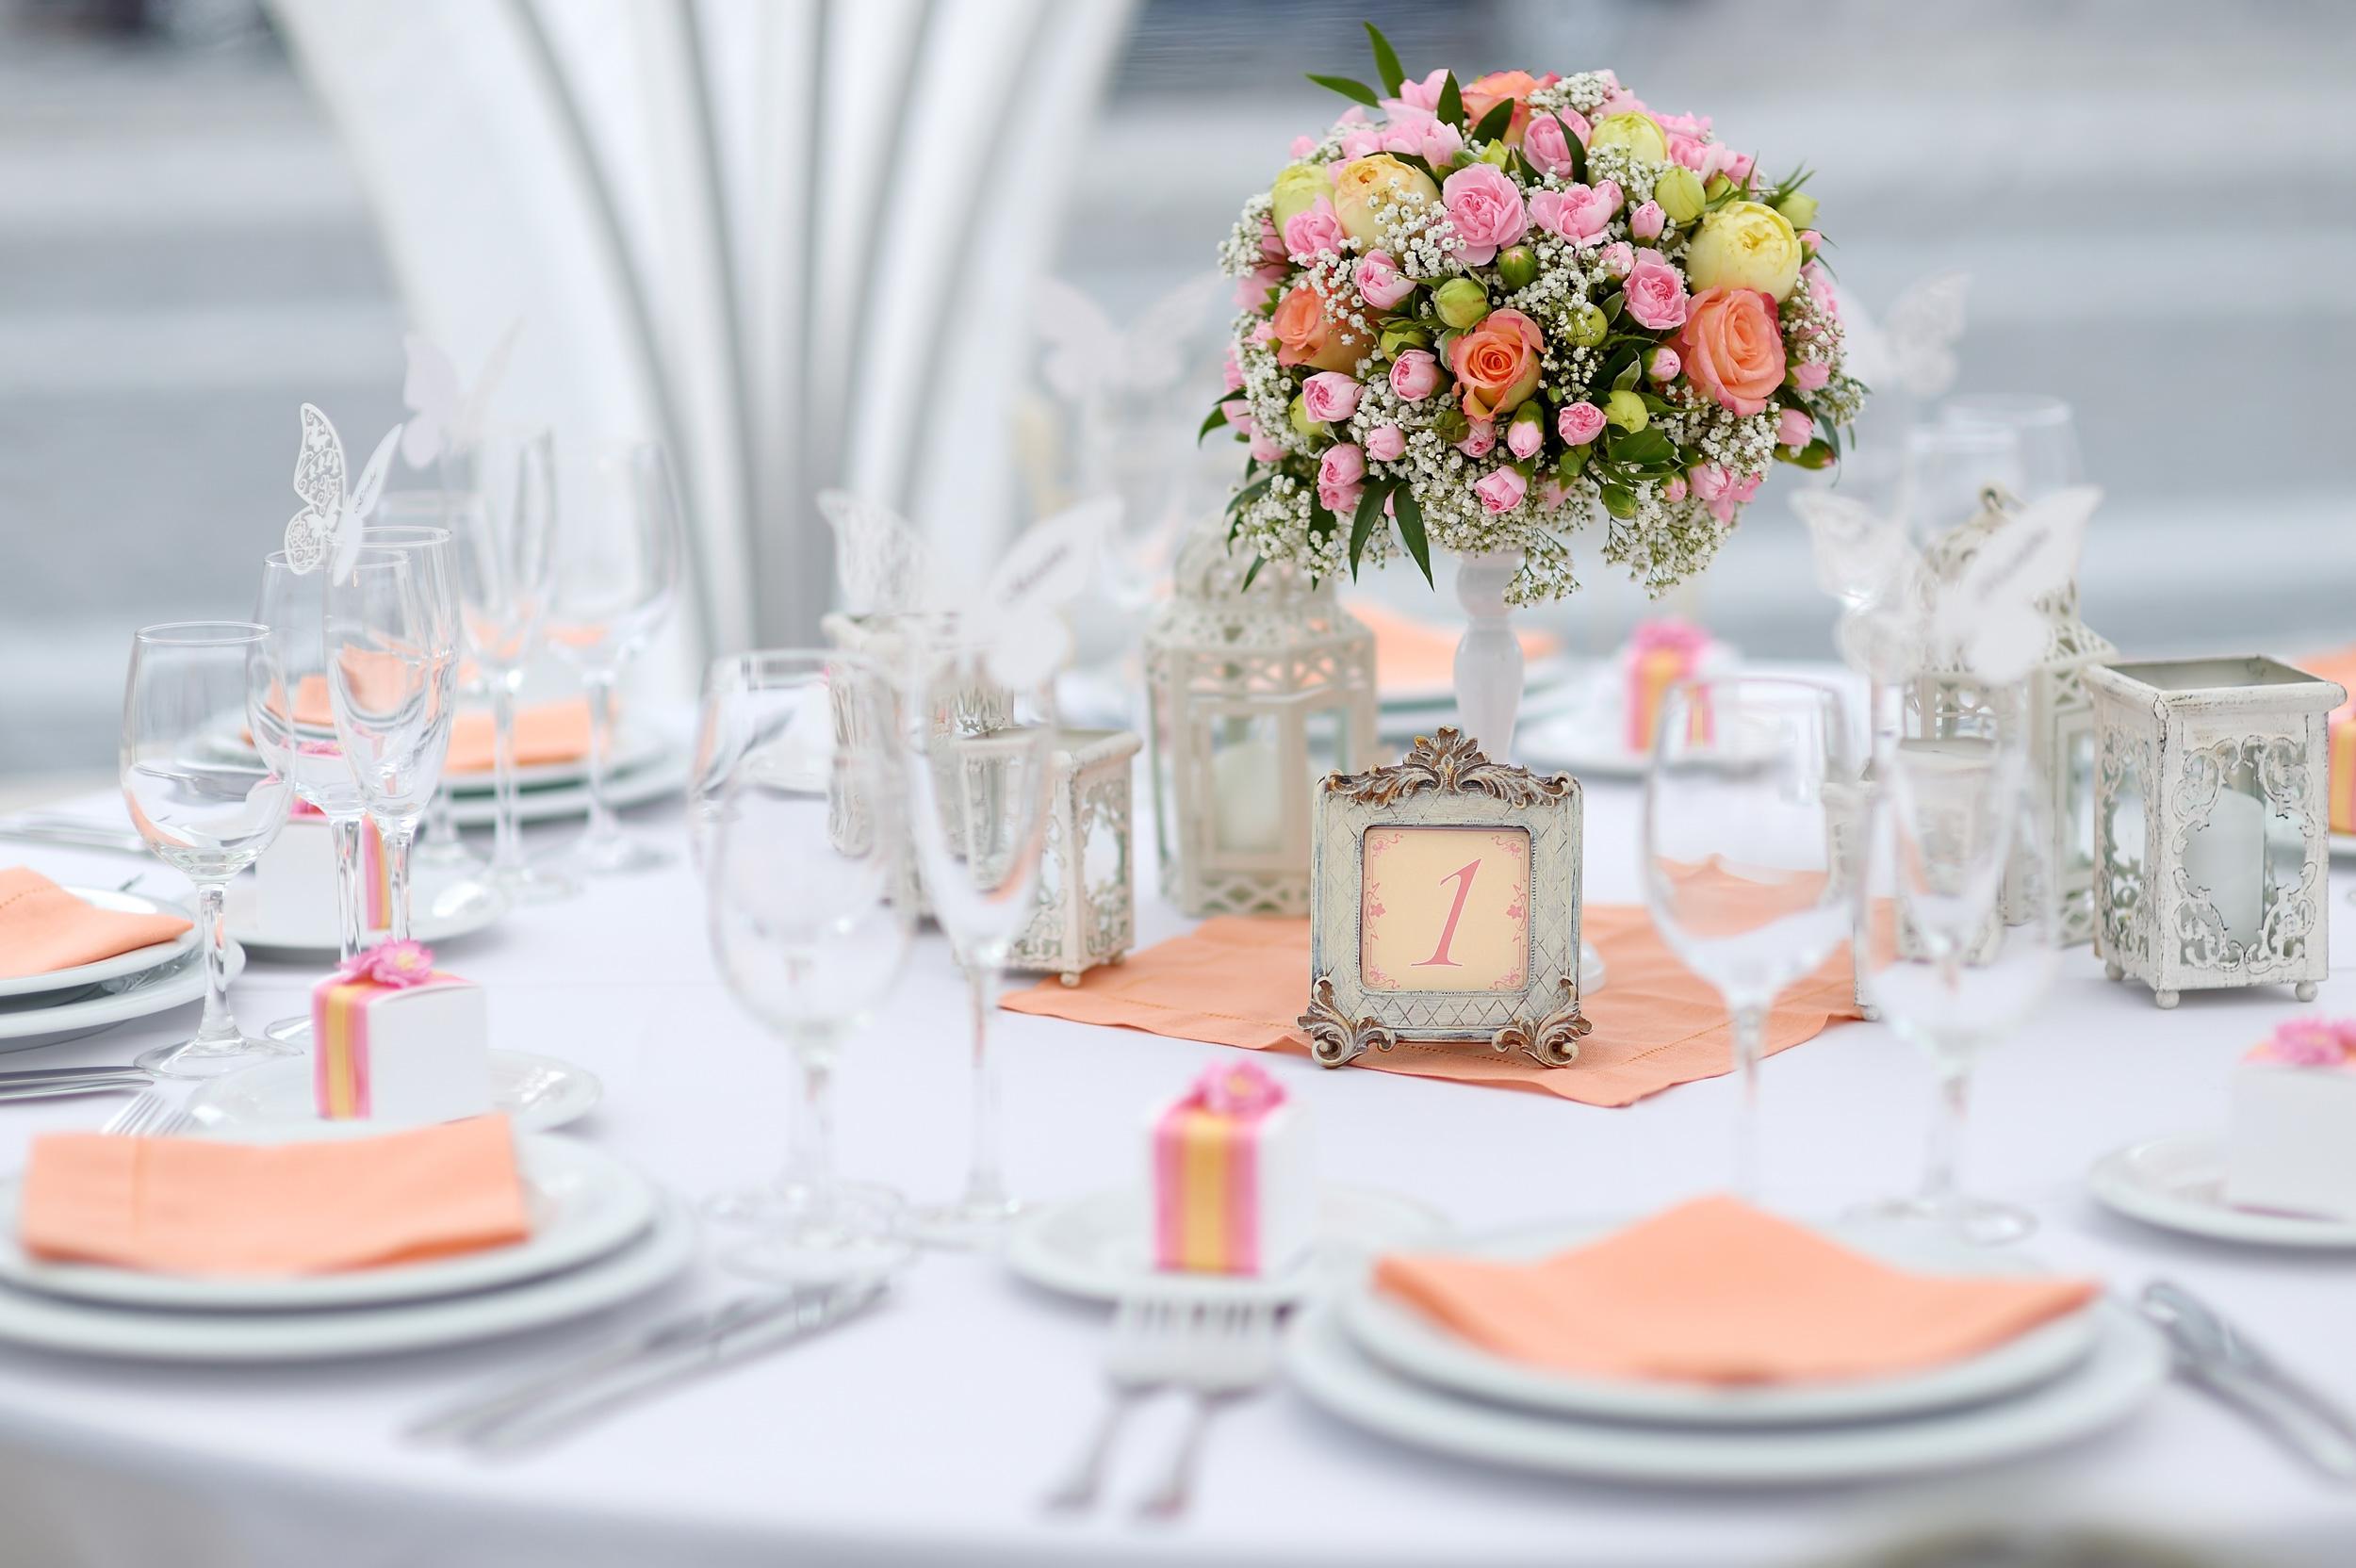 Zirbenschloessl_Hochzeiten_21